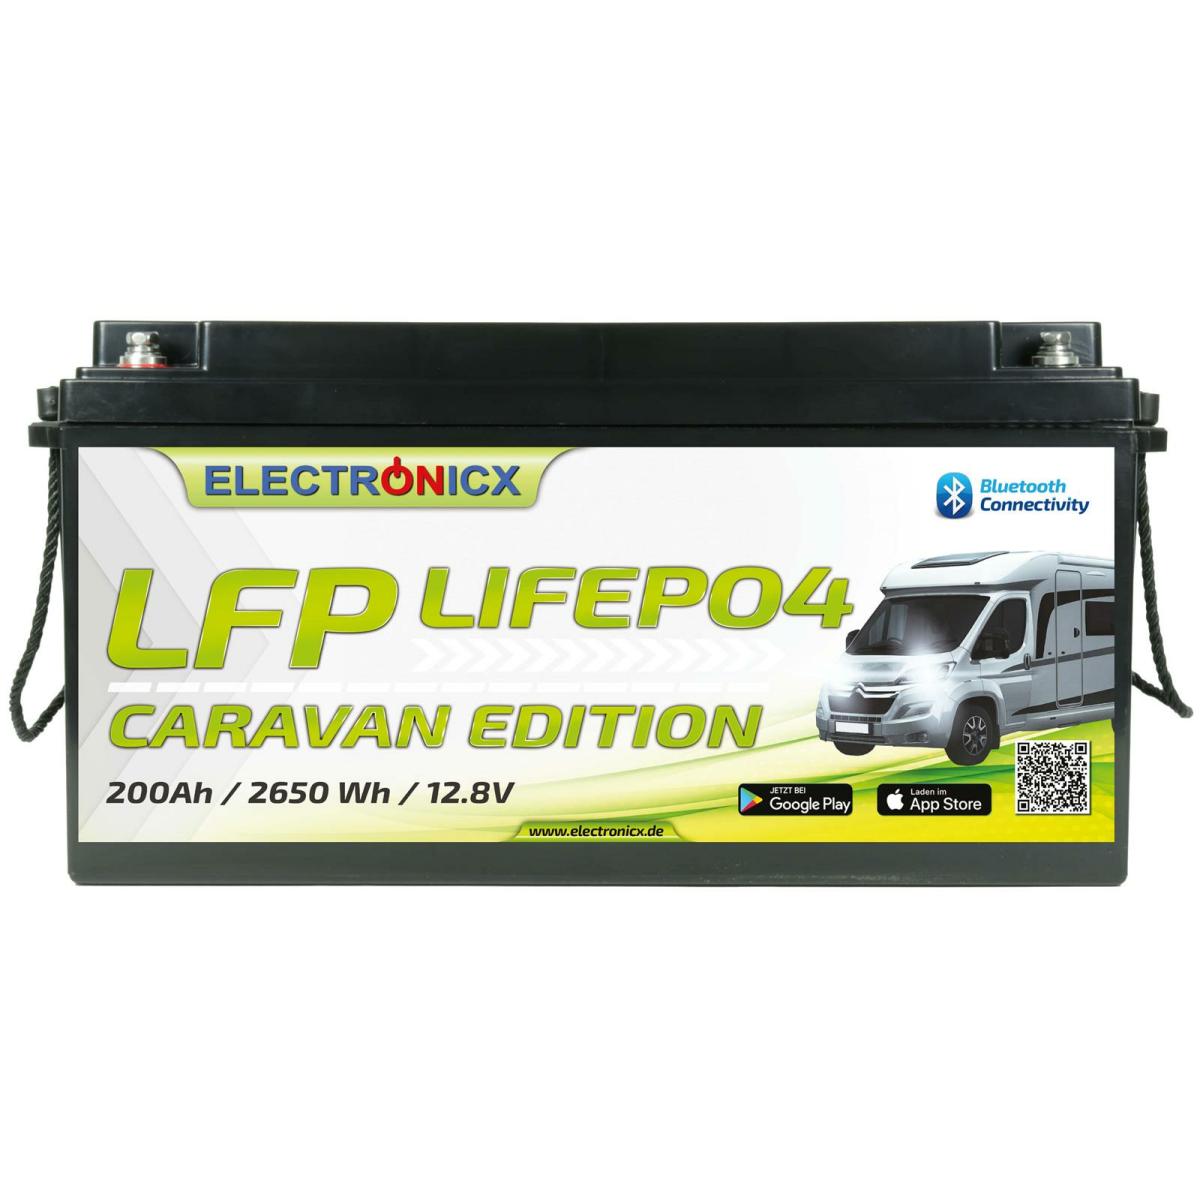 Electronicx Caravan Edition LiFePO4 2560Wh 200Ah LFP Bluetooth APP Lithium-Eisenphosphat